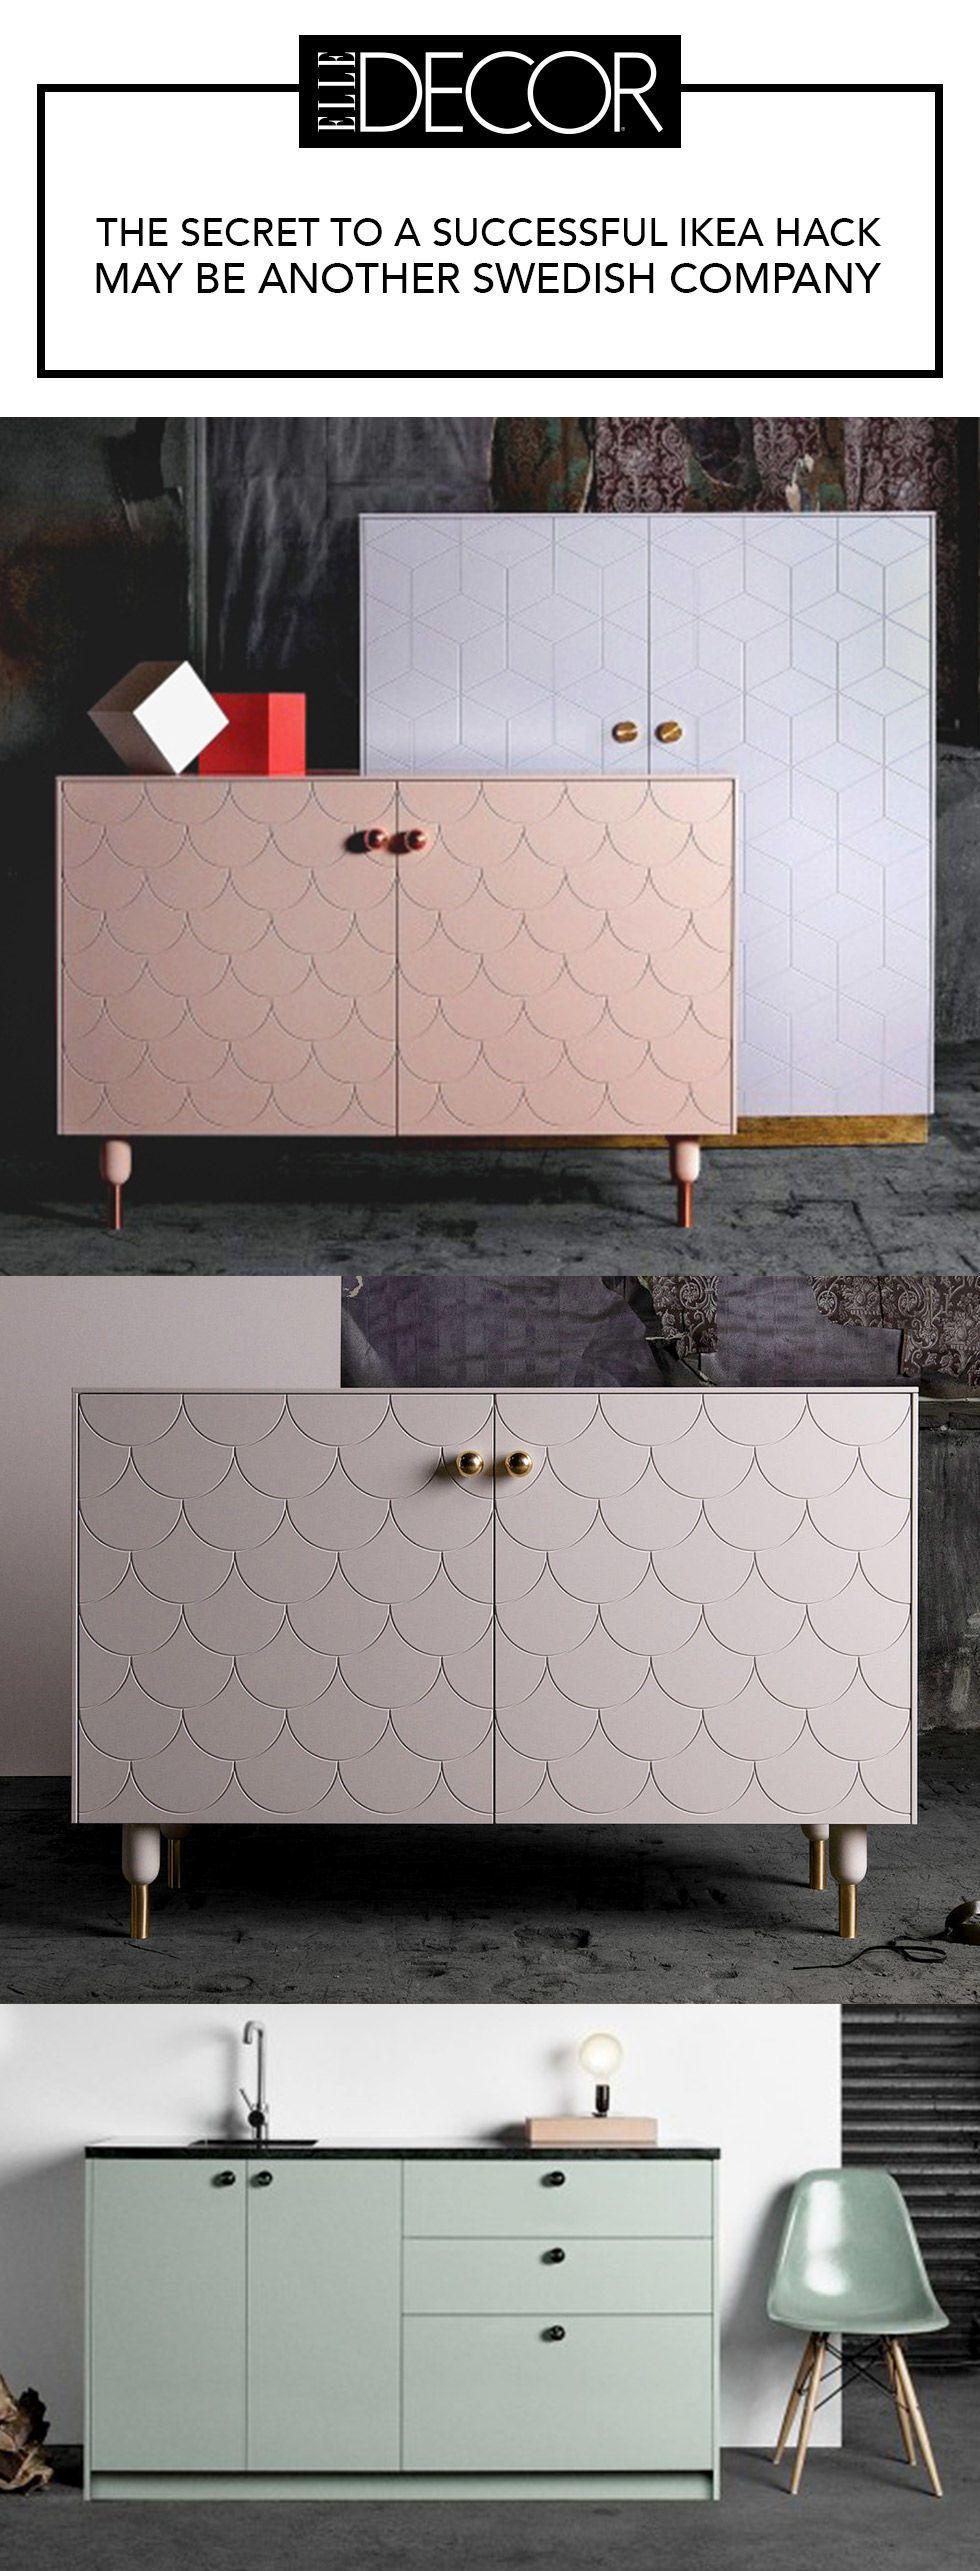 how to make your ikea furniture look expensive ikea newsliquor cabinetikea hacksdiy